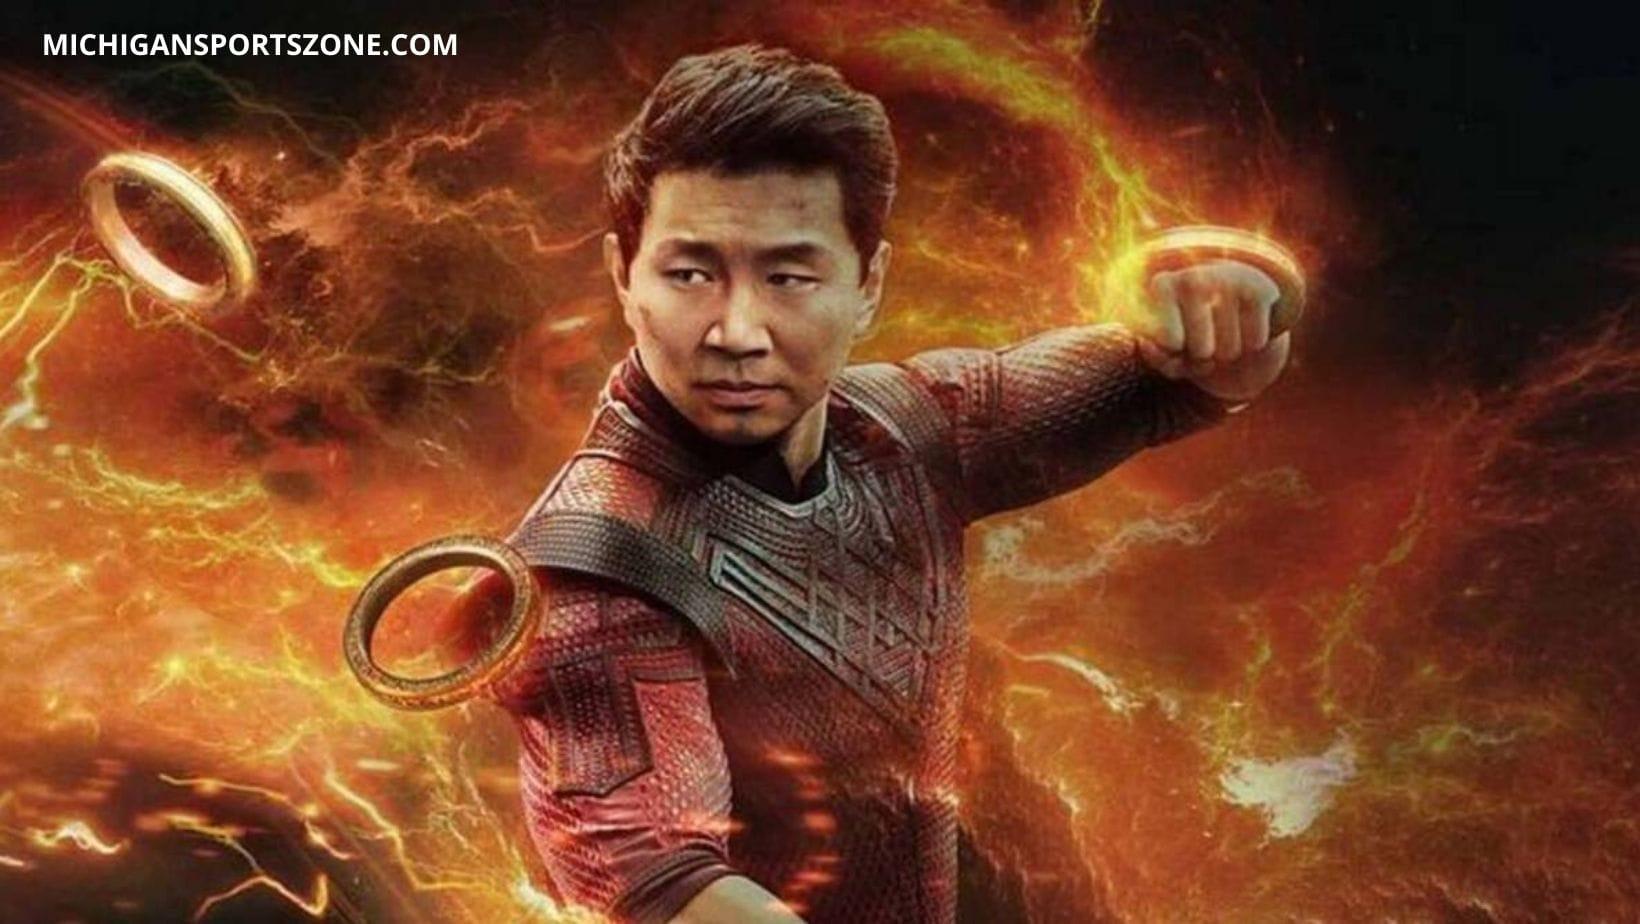 Simu-liu-shang-chi-and-the-legend-of-the-ten-rings